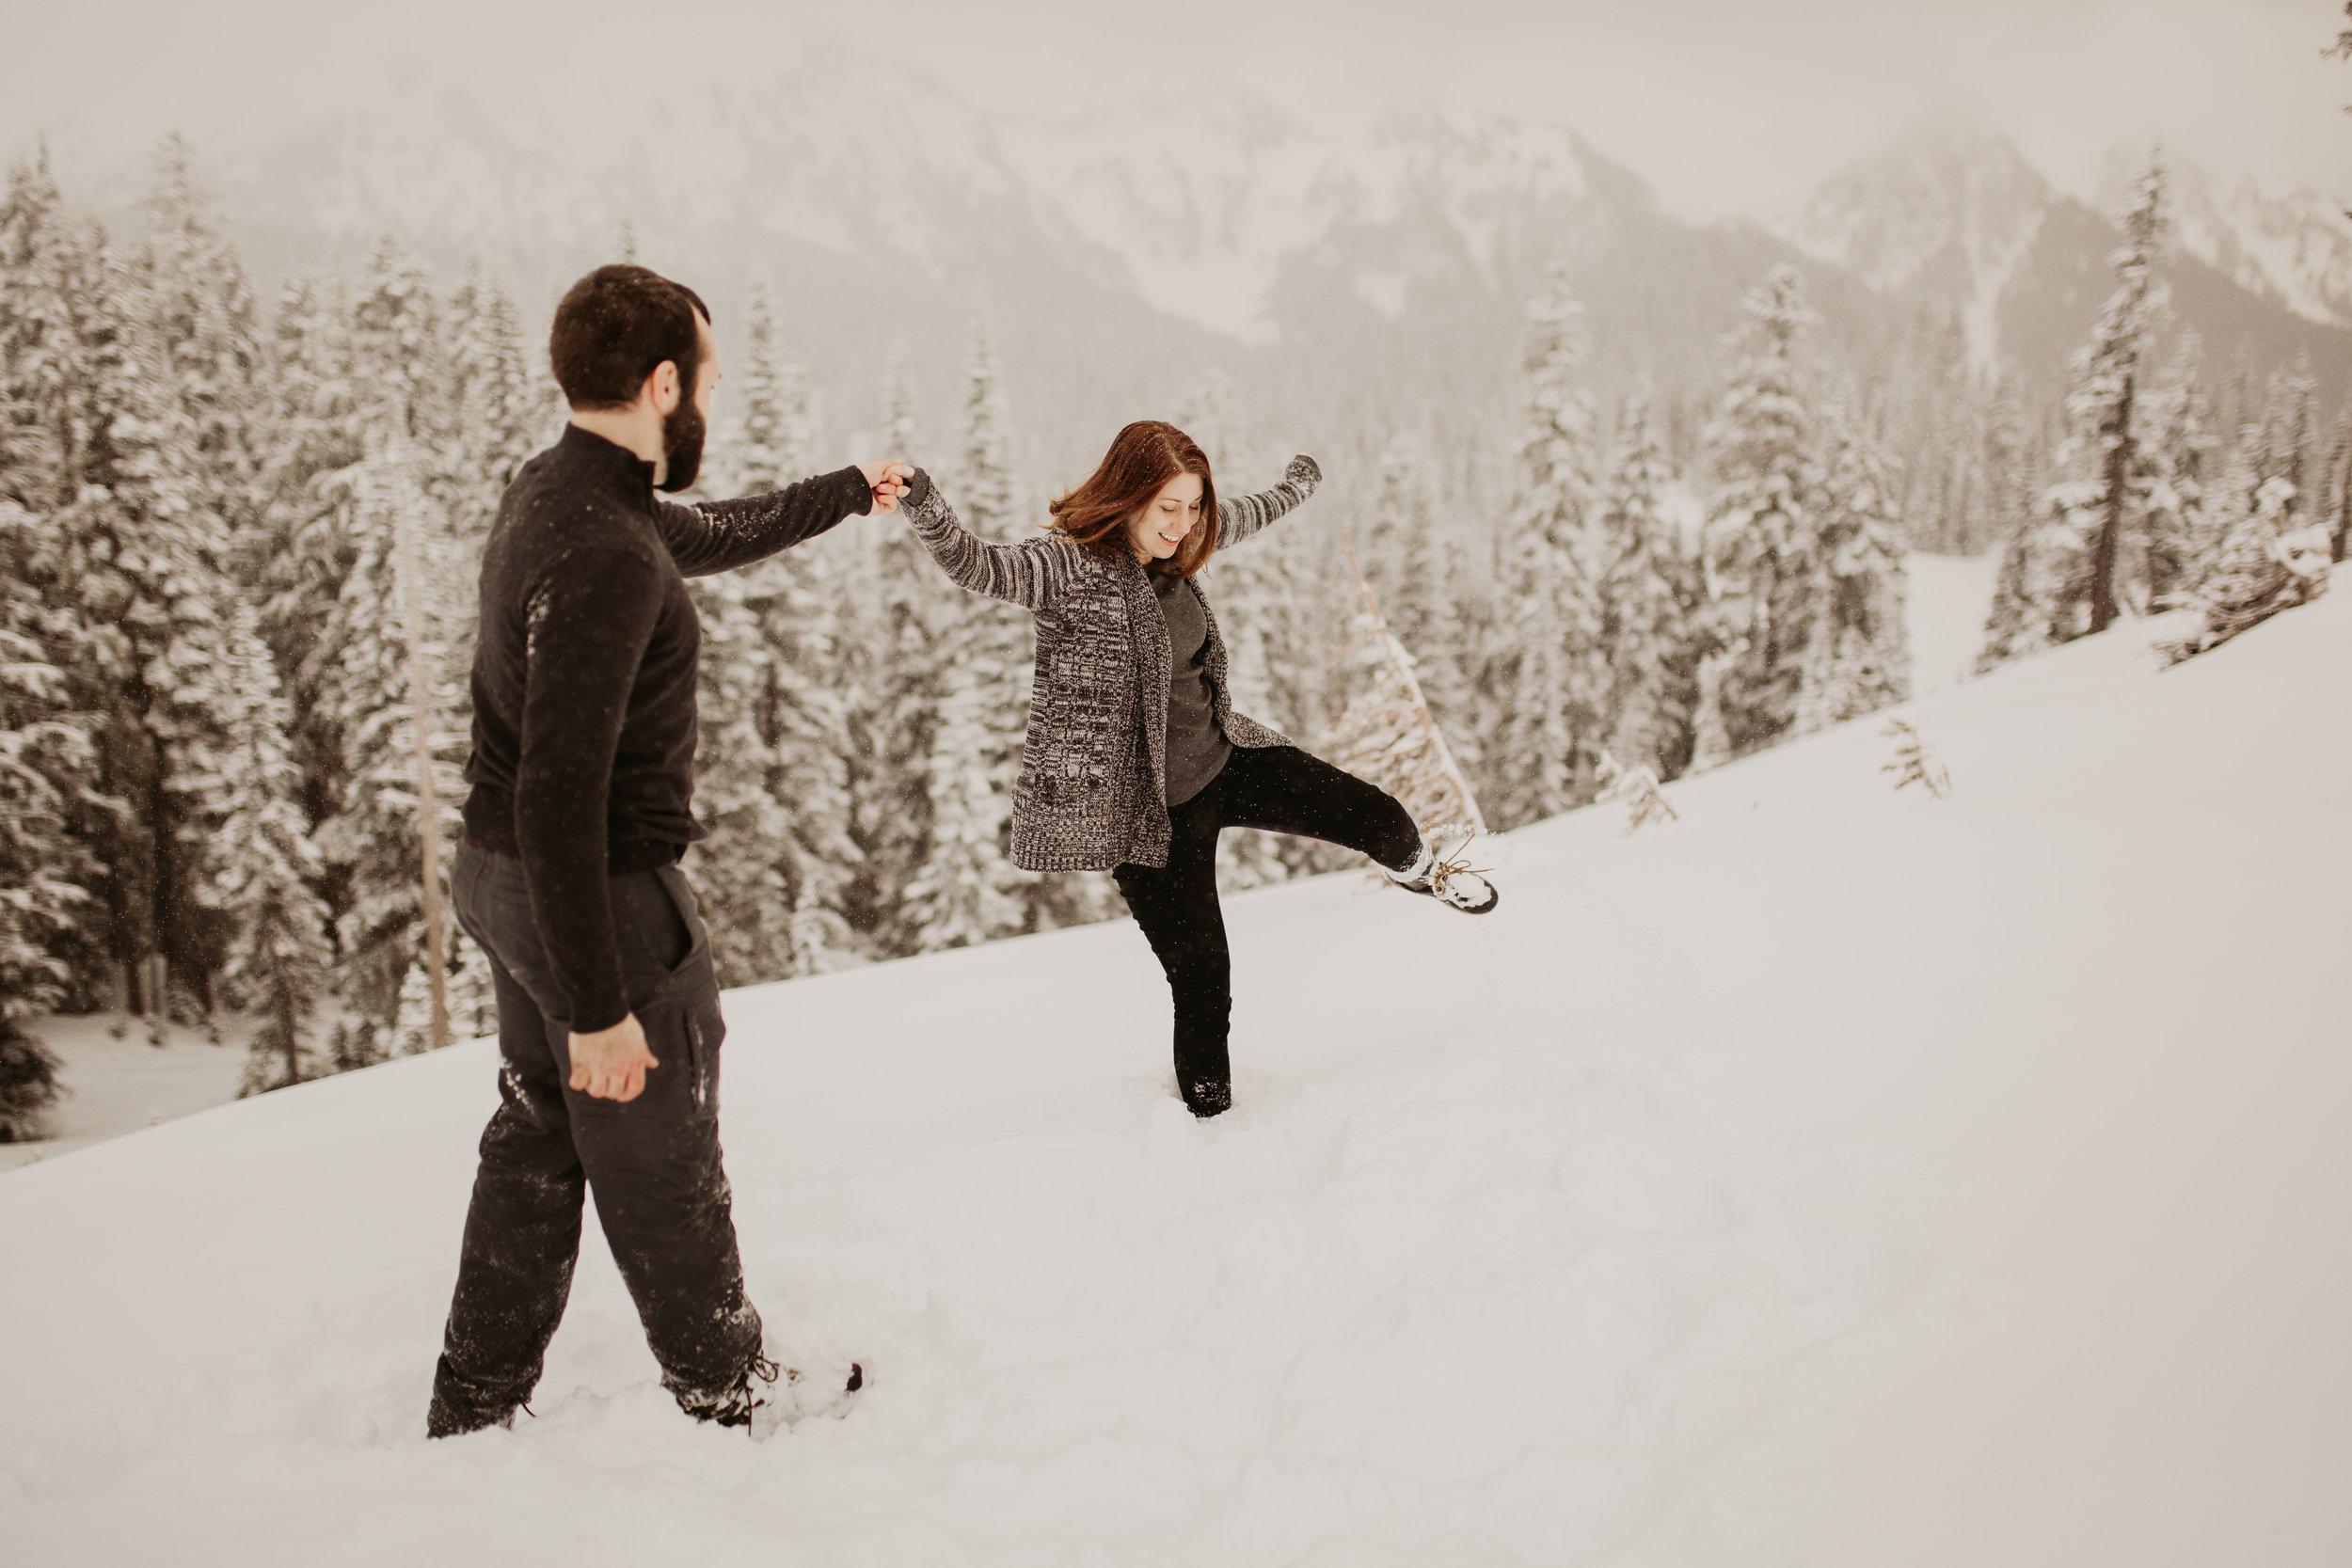 pnw_washington_oregon_elopement_mount_rainer_engagement_wedding_photographer04.jpg